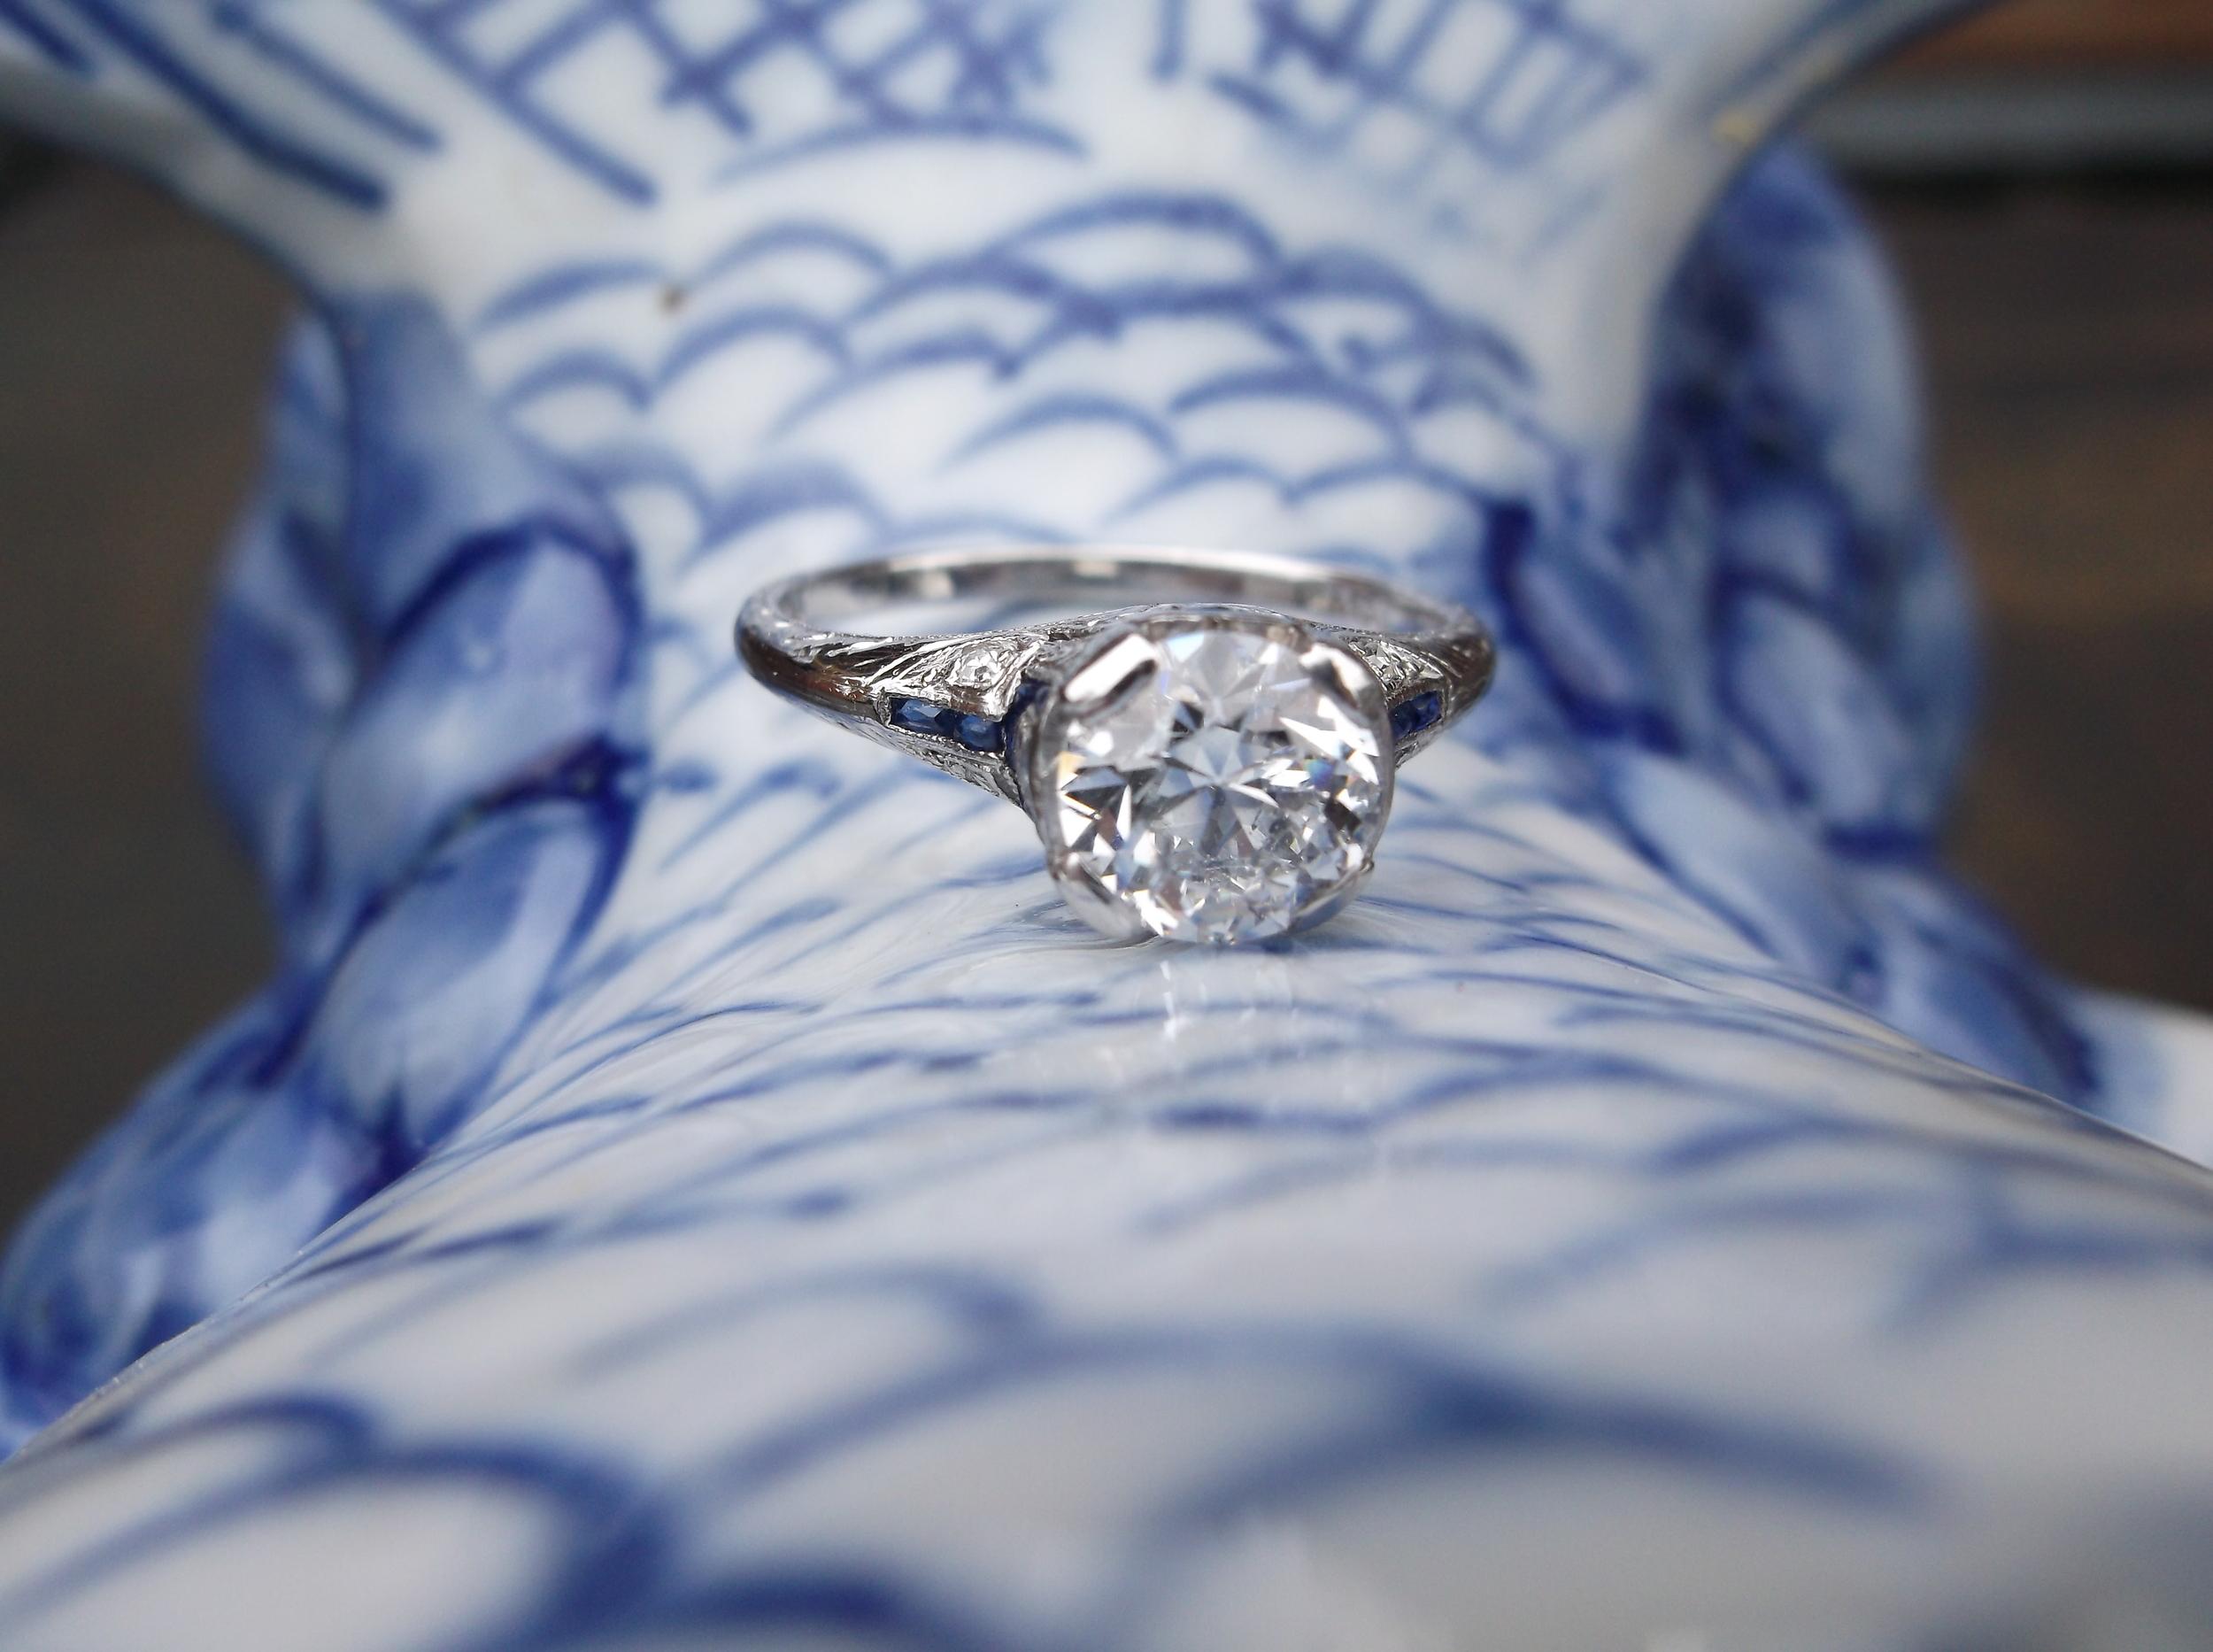 1.21 carat diamond and sapphire ring